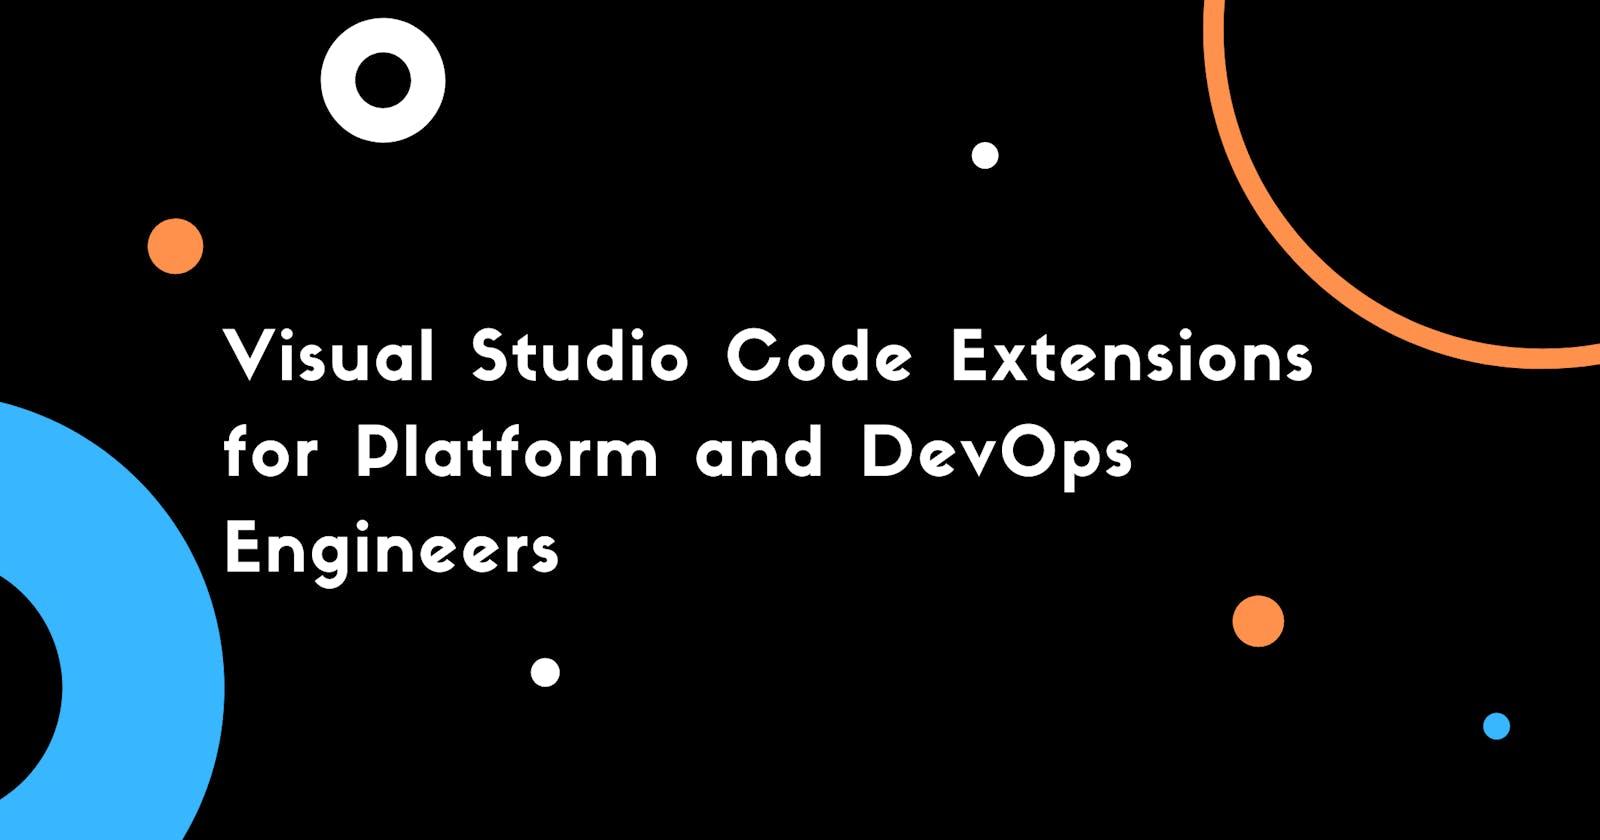 Visual Studio Code Extensions for Platform and DevOps Engineers